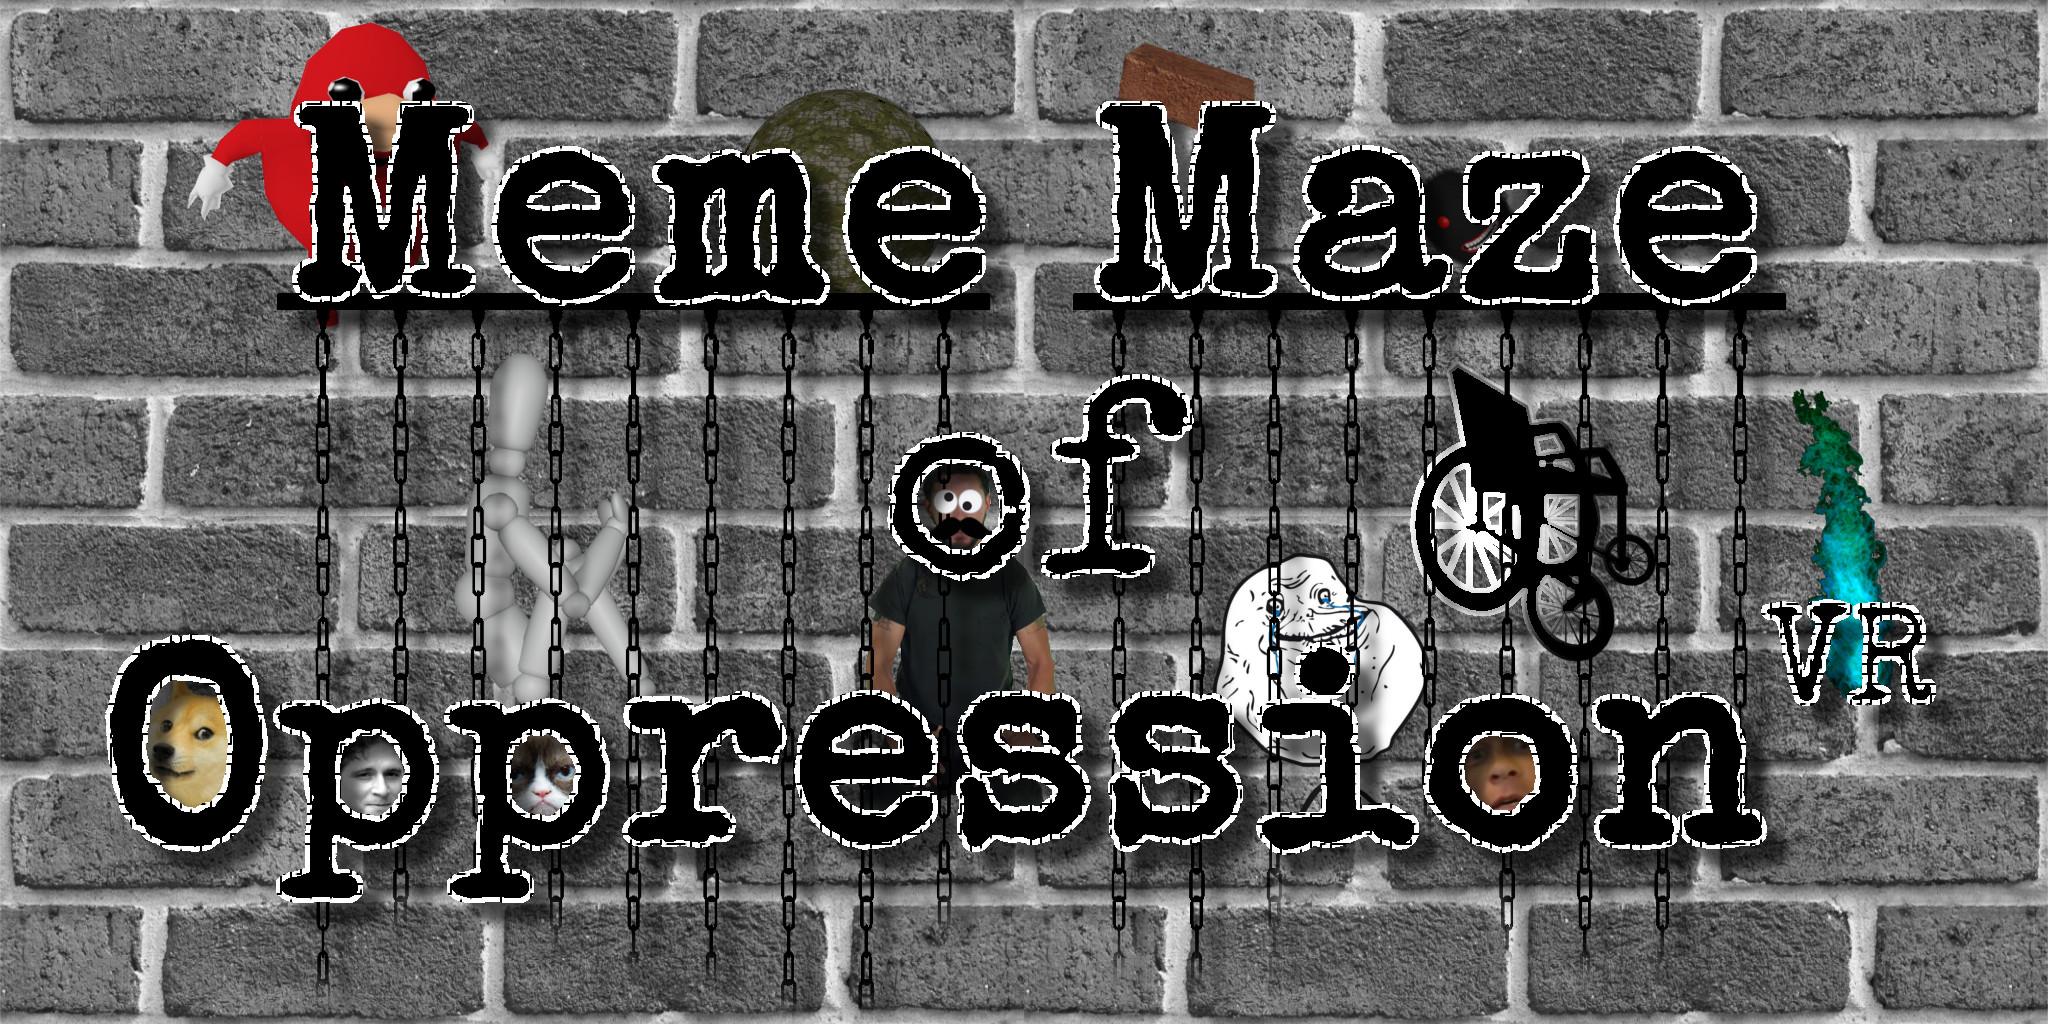 Meme Maze of Oppression VR